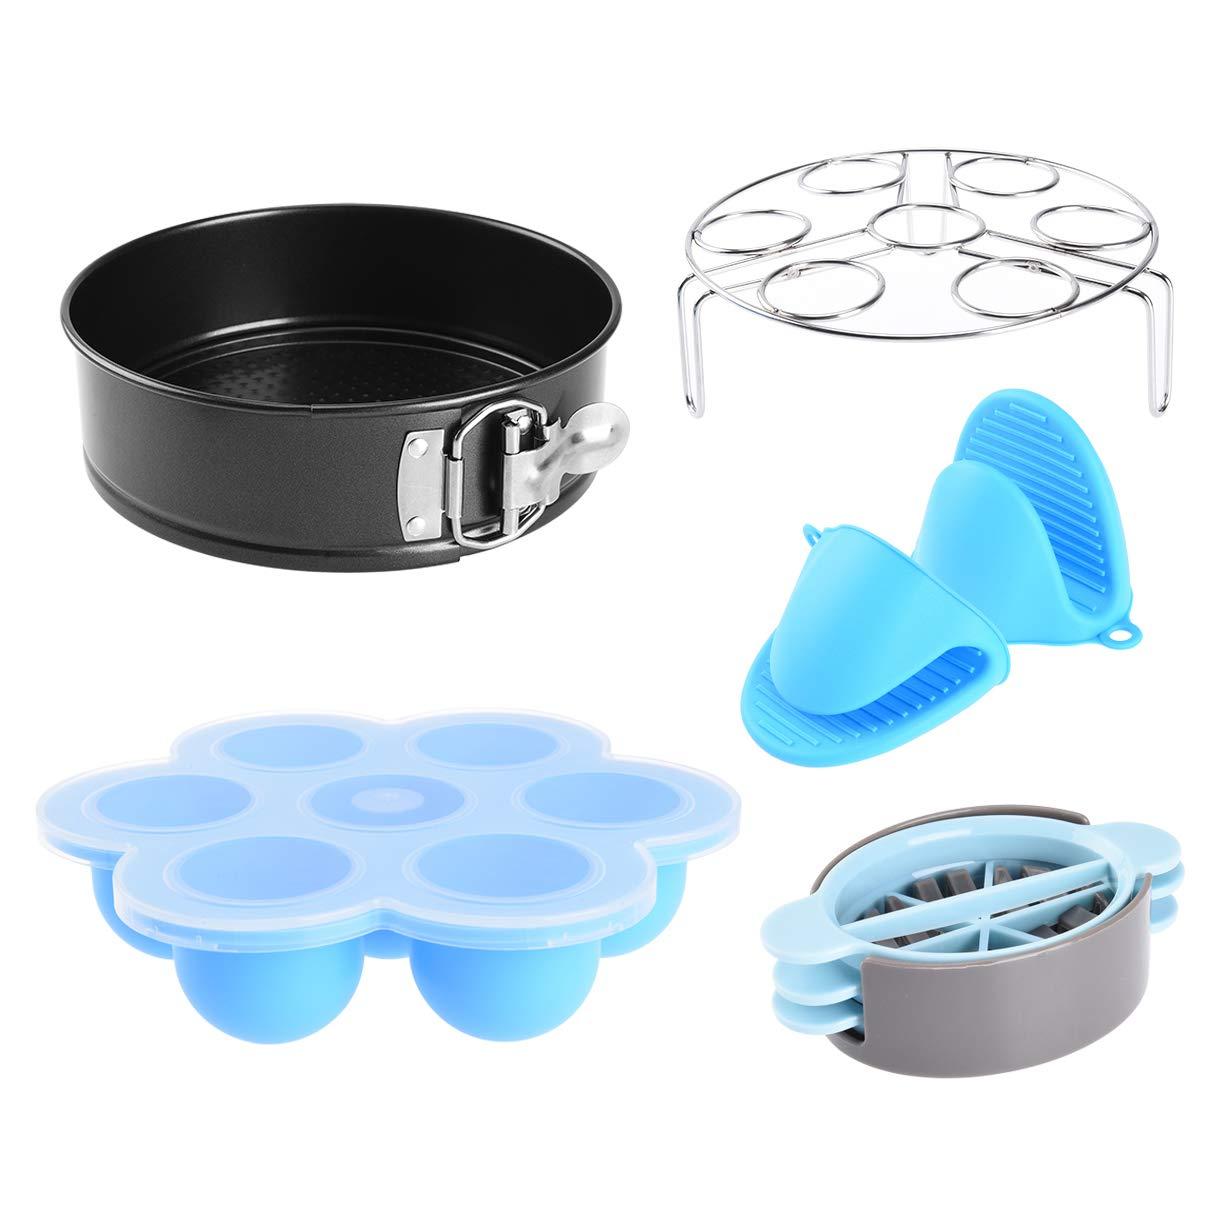 Uarter Instant Pots Accessories Set 7inch Carbon Steel Cake Pan Stainless Steel Egg Steamer Rack Silicone Egg Bites Mold Oven Mitts Egg Slicer, Set of 5